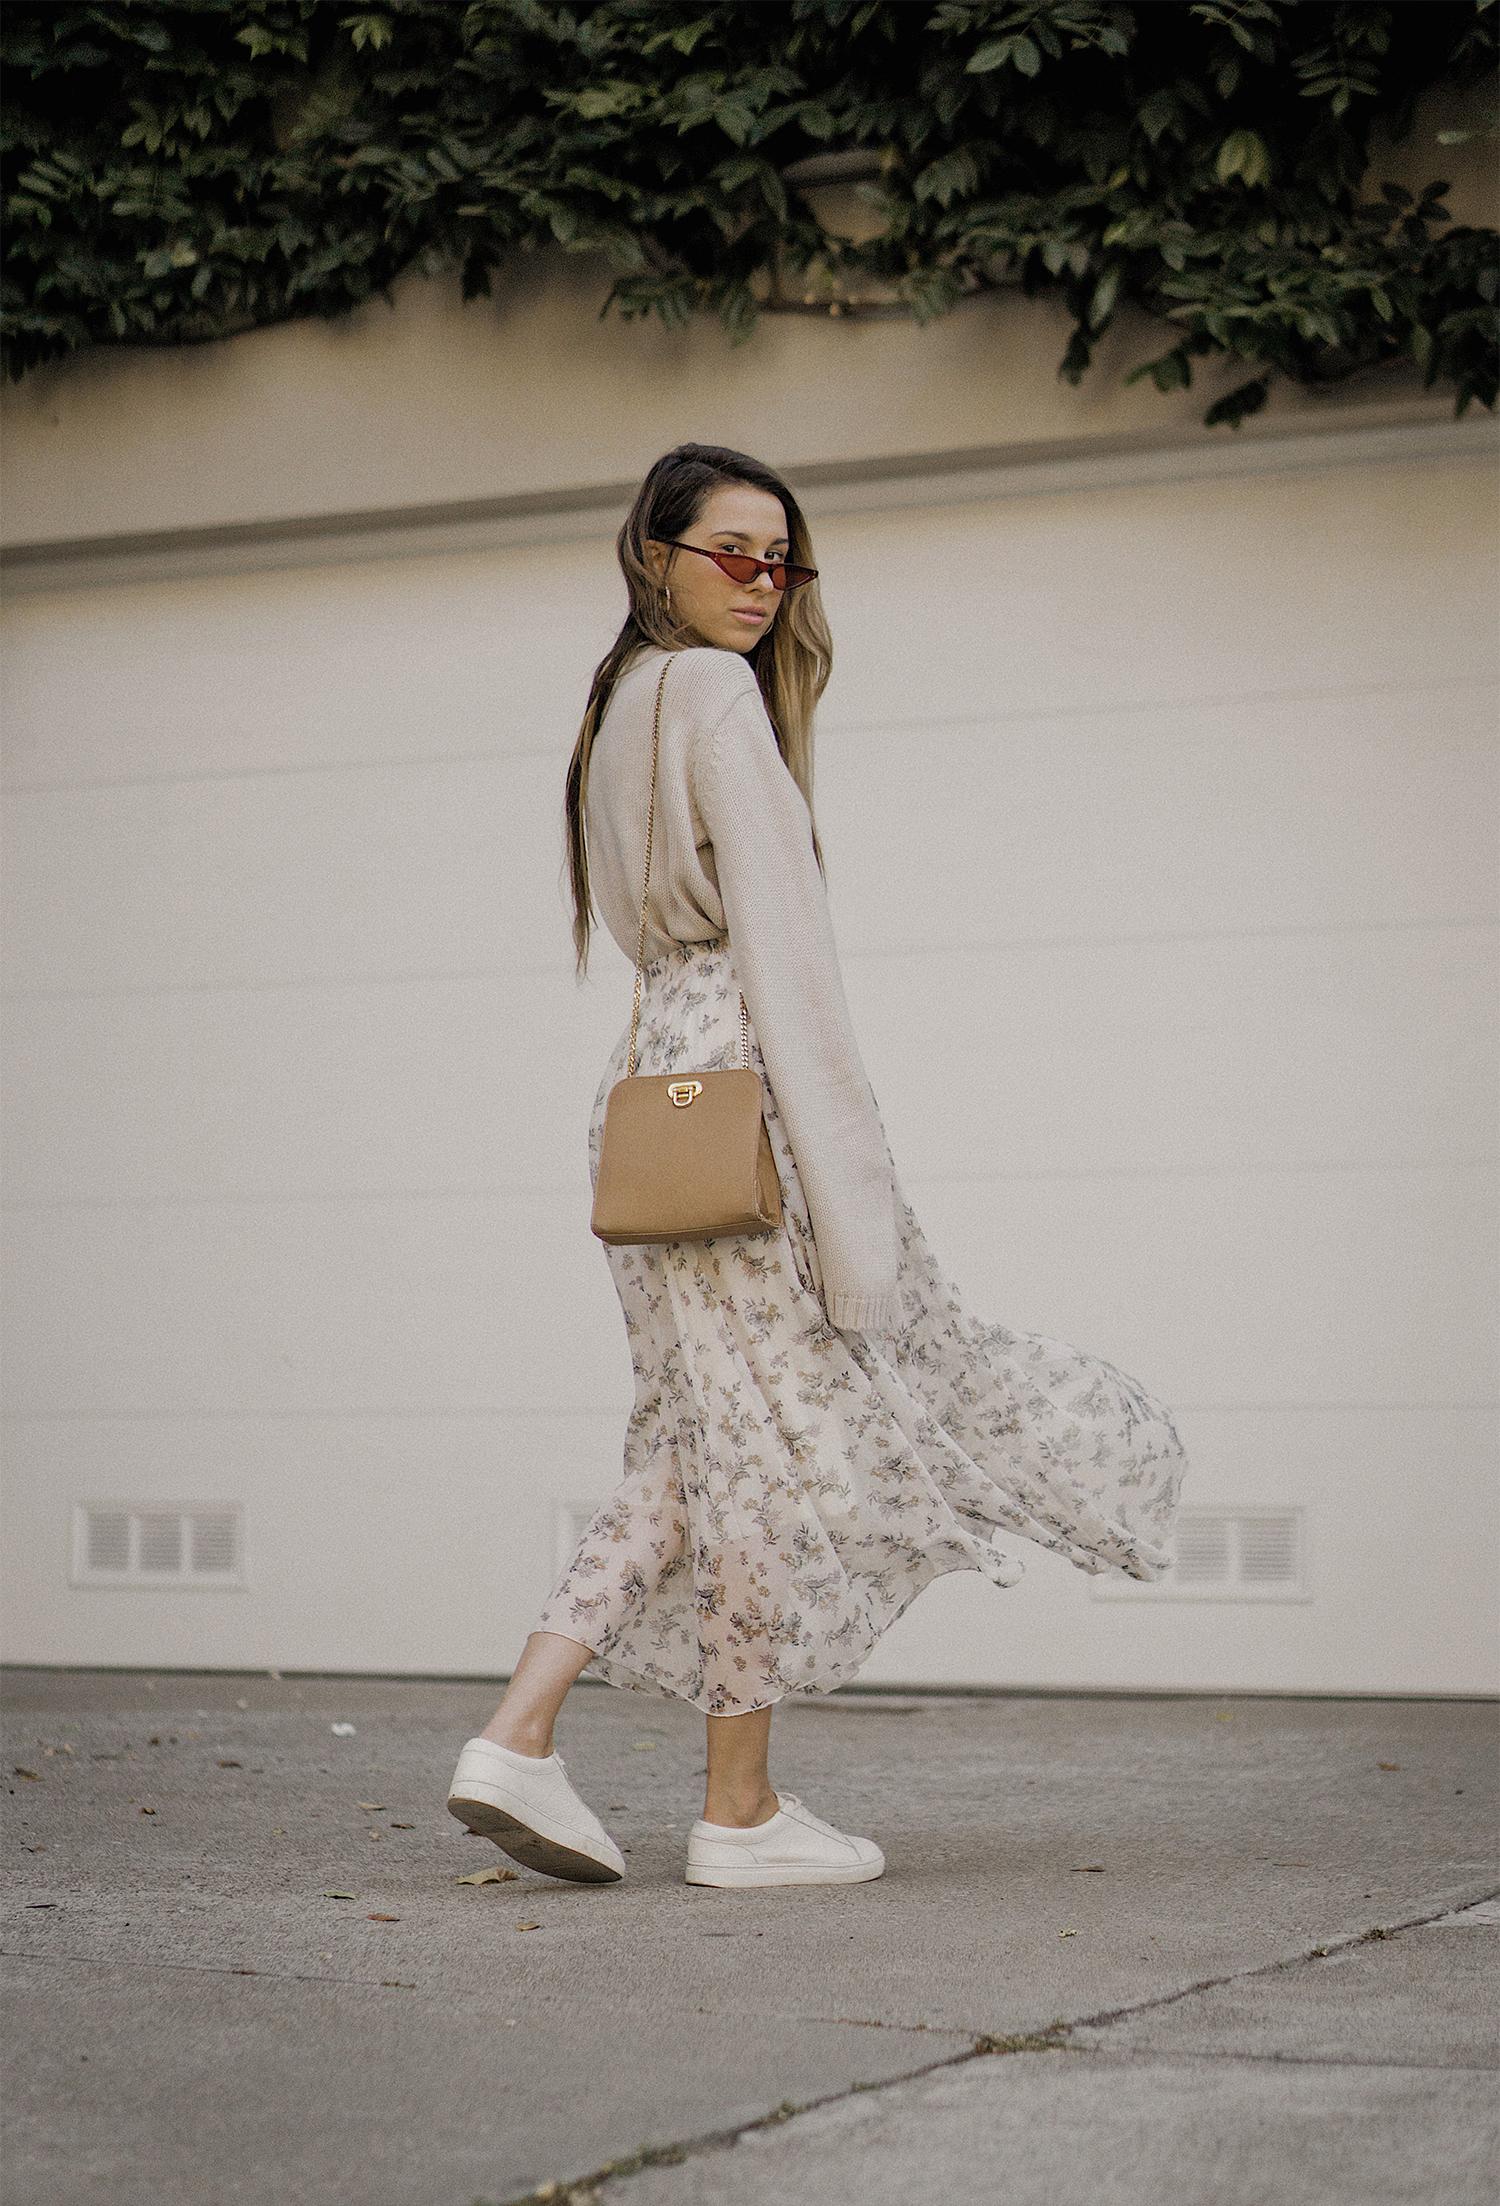 neutral_outfit_street_style_look_beige_tobi_sweater_long_skirt_romantic_beret_sneakers_vintage_lena_juice_the_white_ocean_02